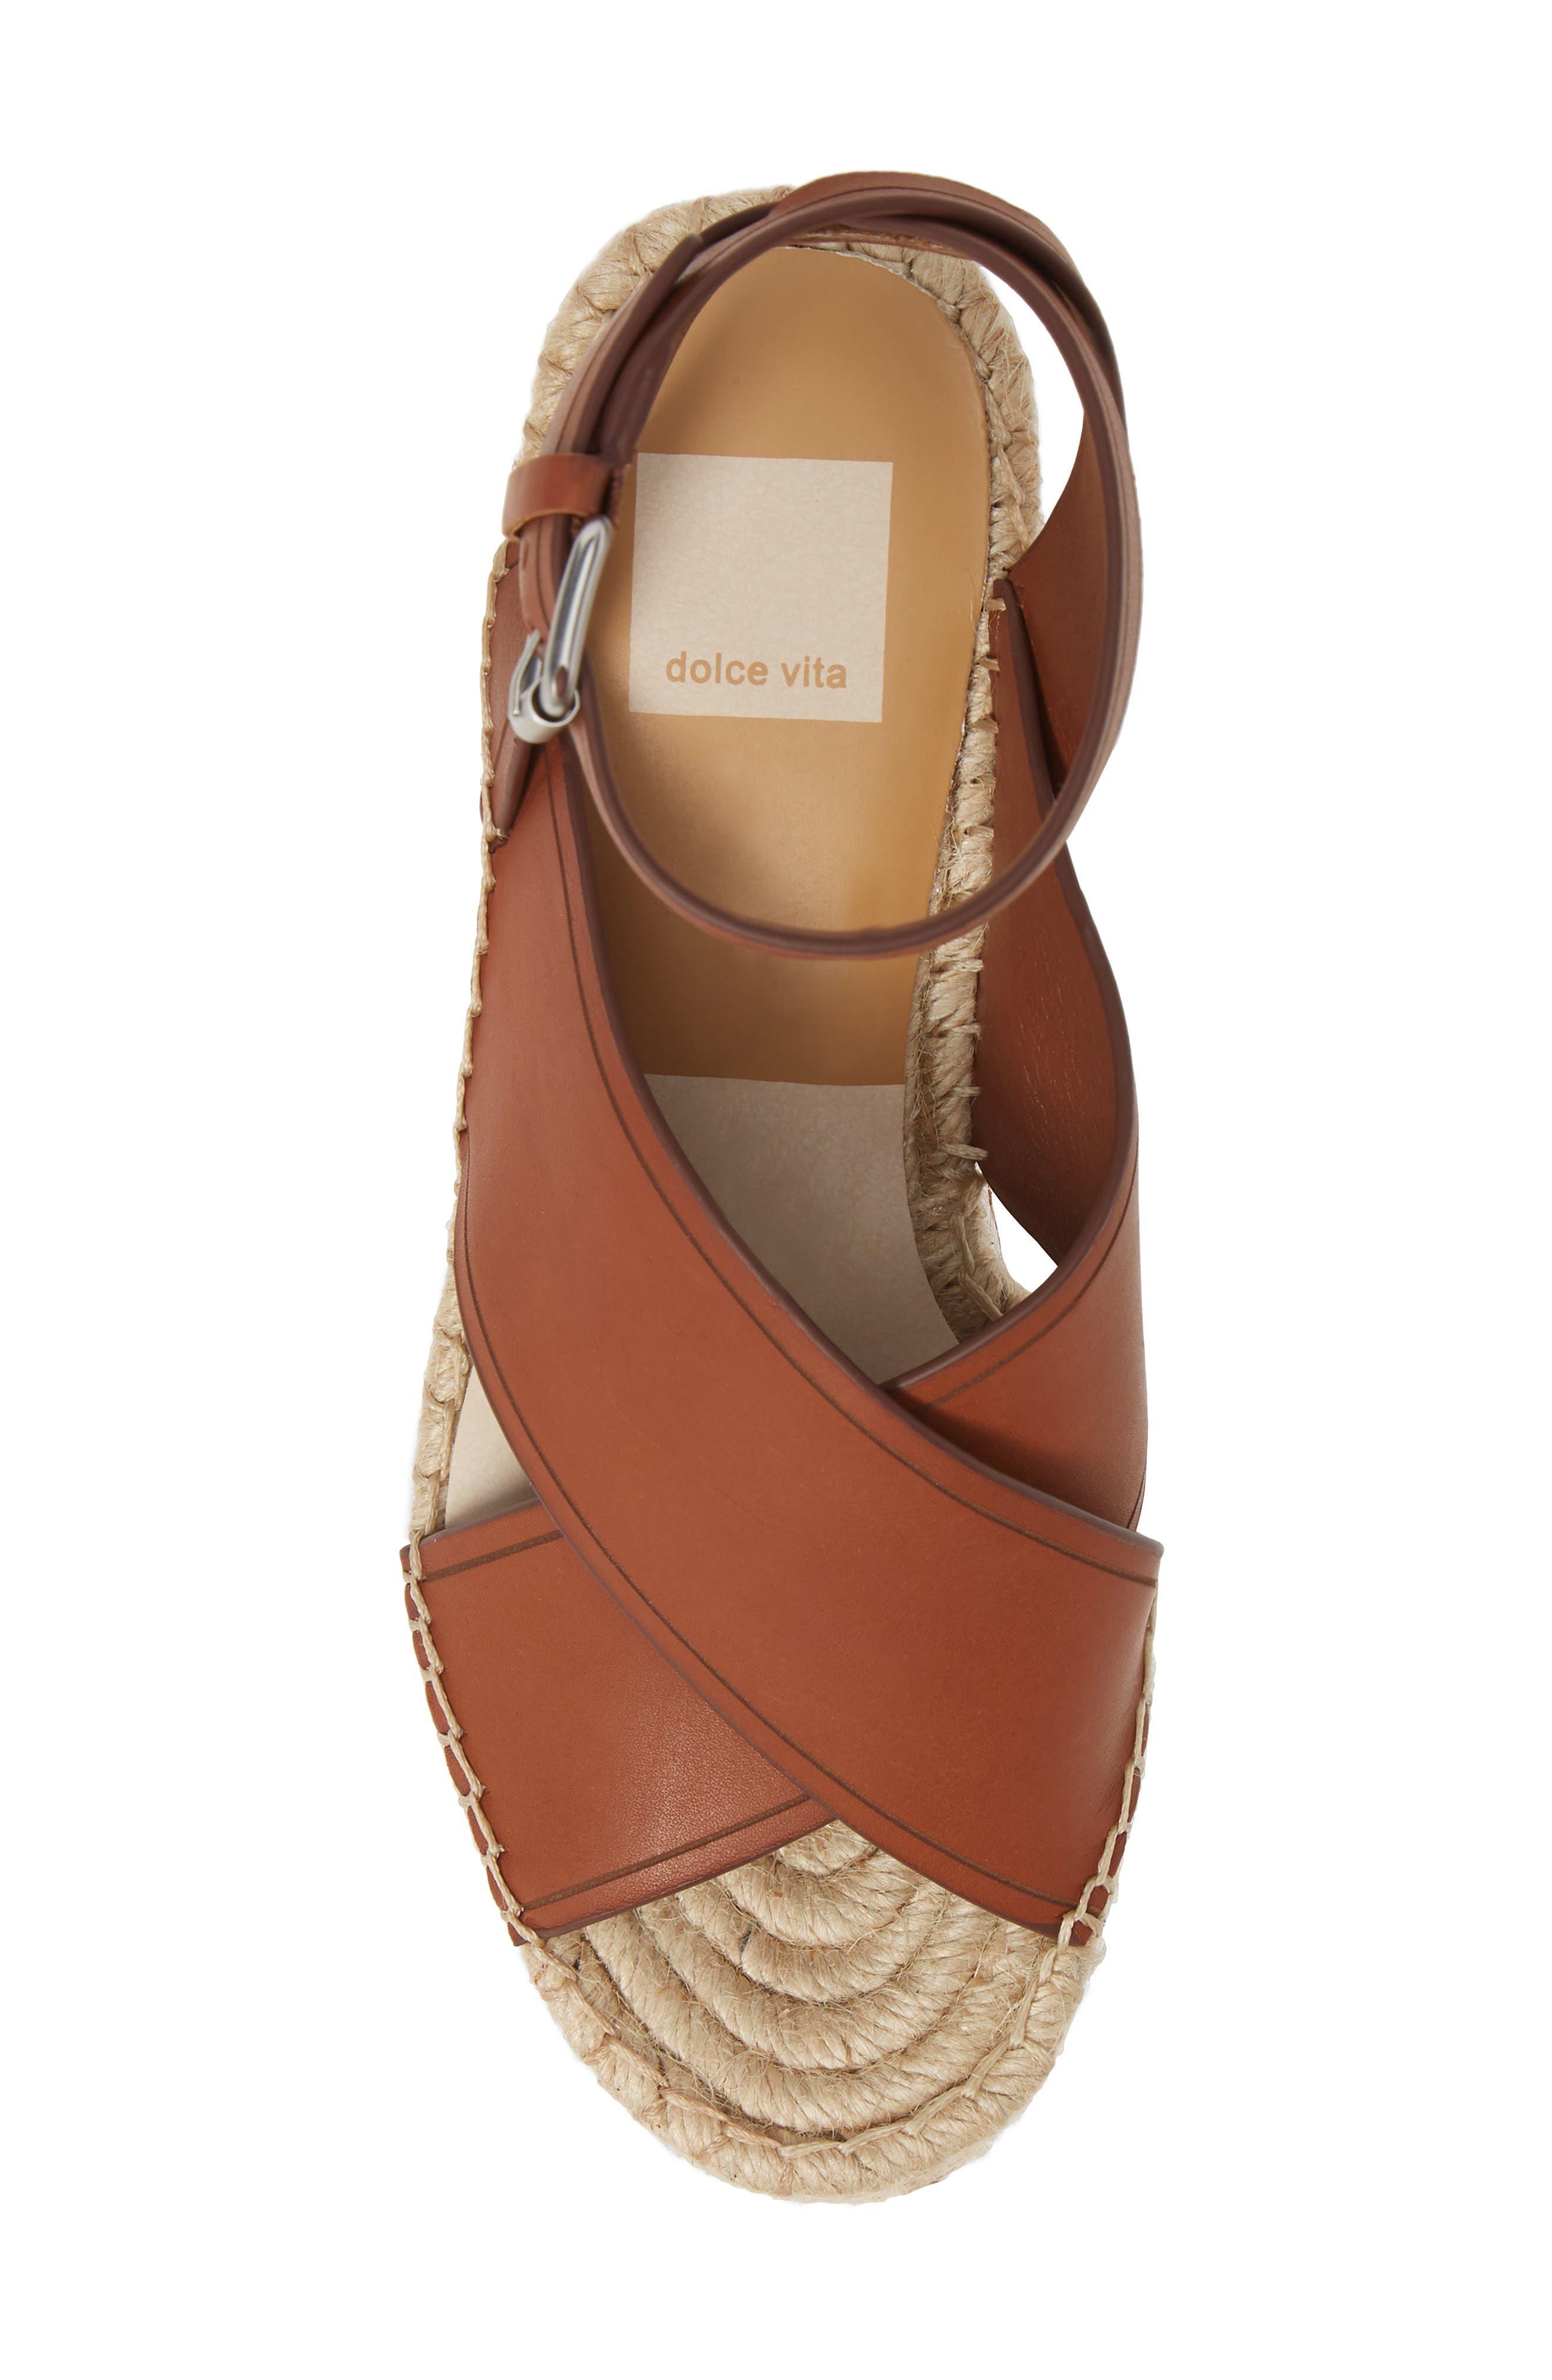 DOLCE VITA, Carsie Platform Sandal, Alternate thumbnail 5, color, BROWN LEATHER